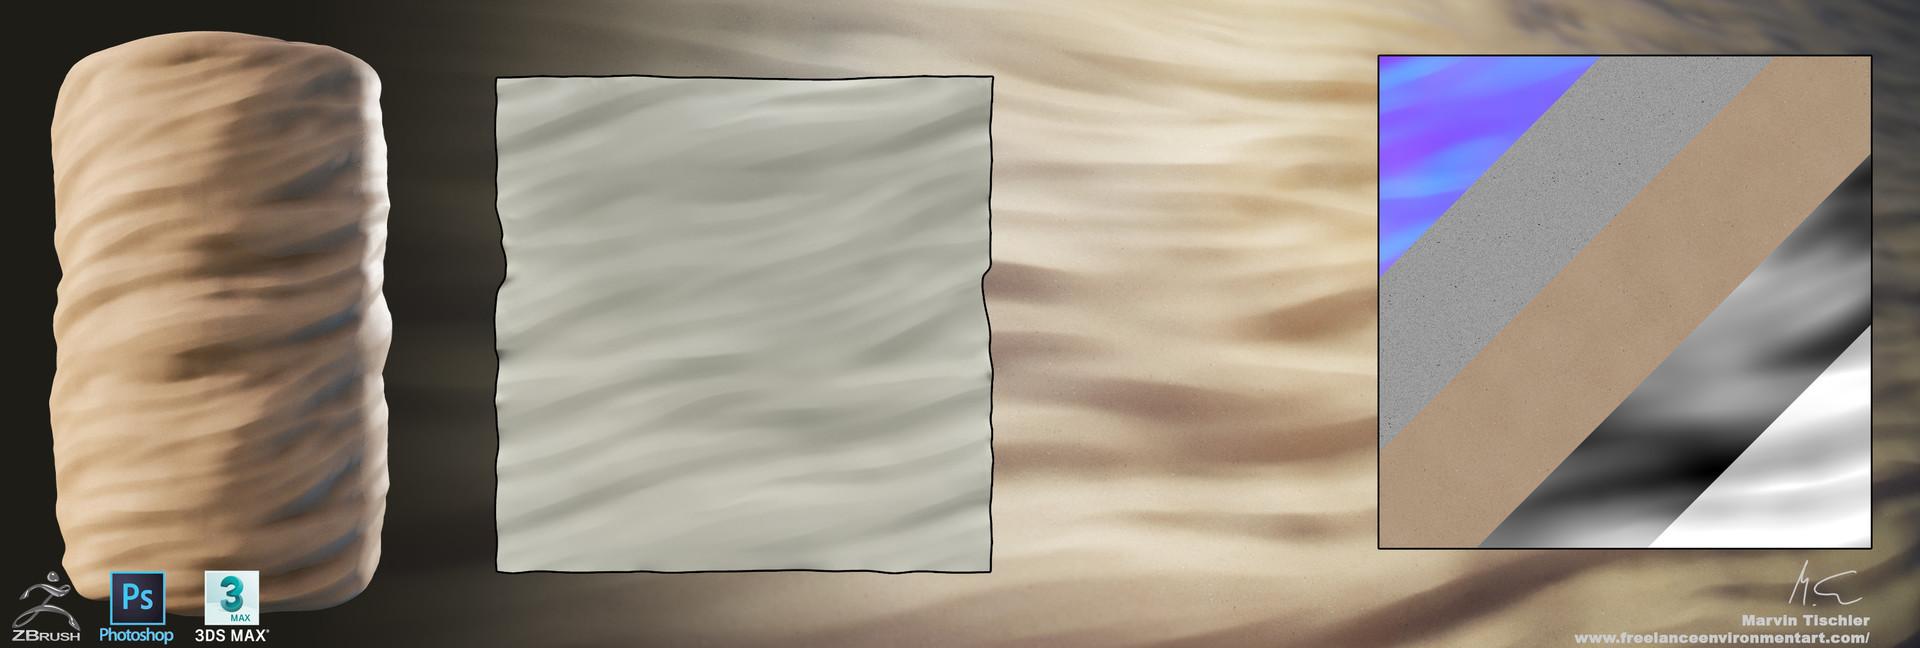 Marvin tischler textures 002 d